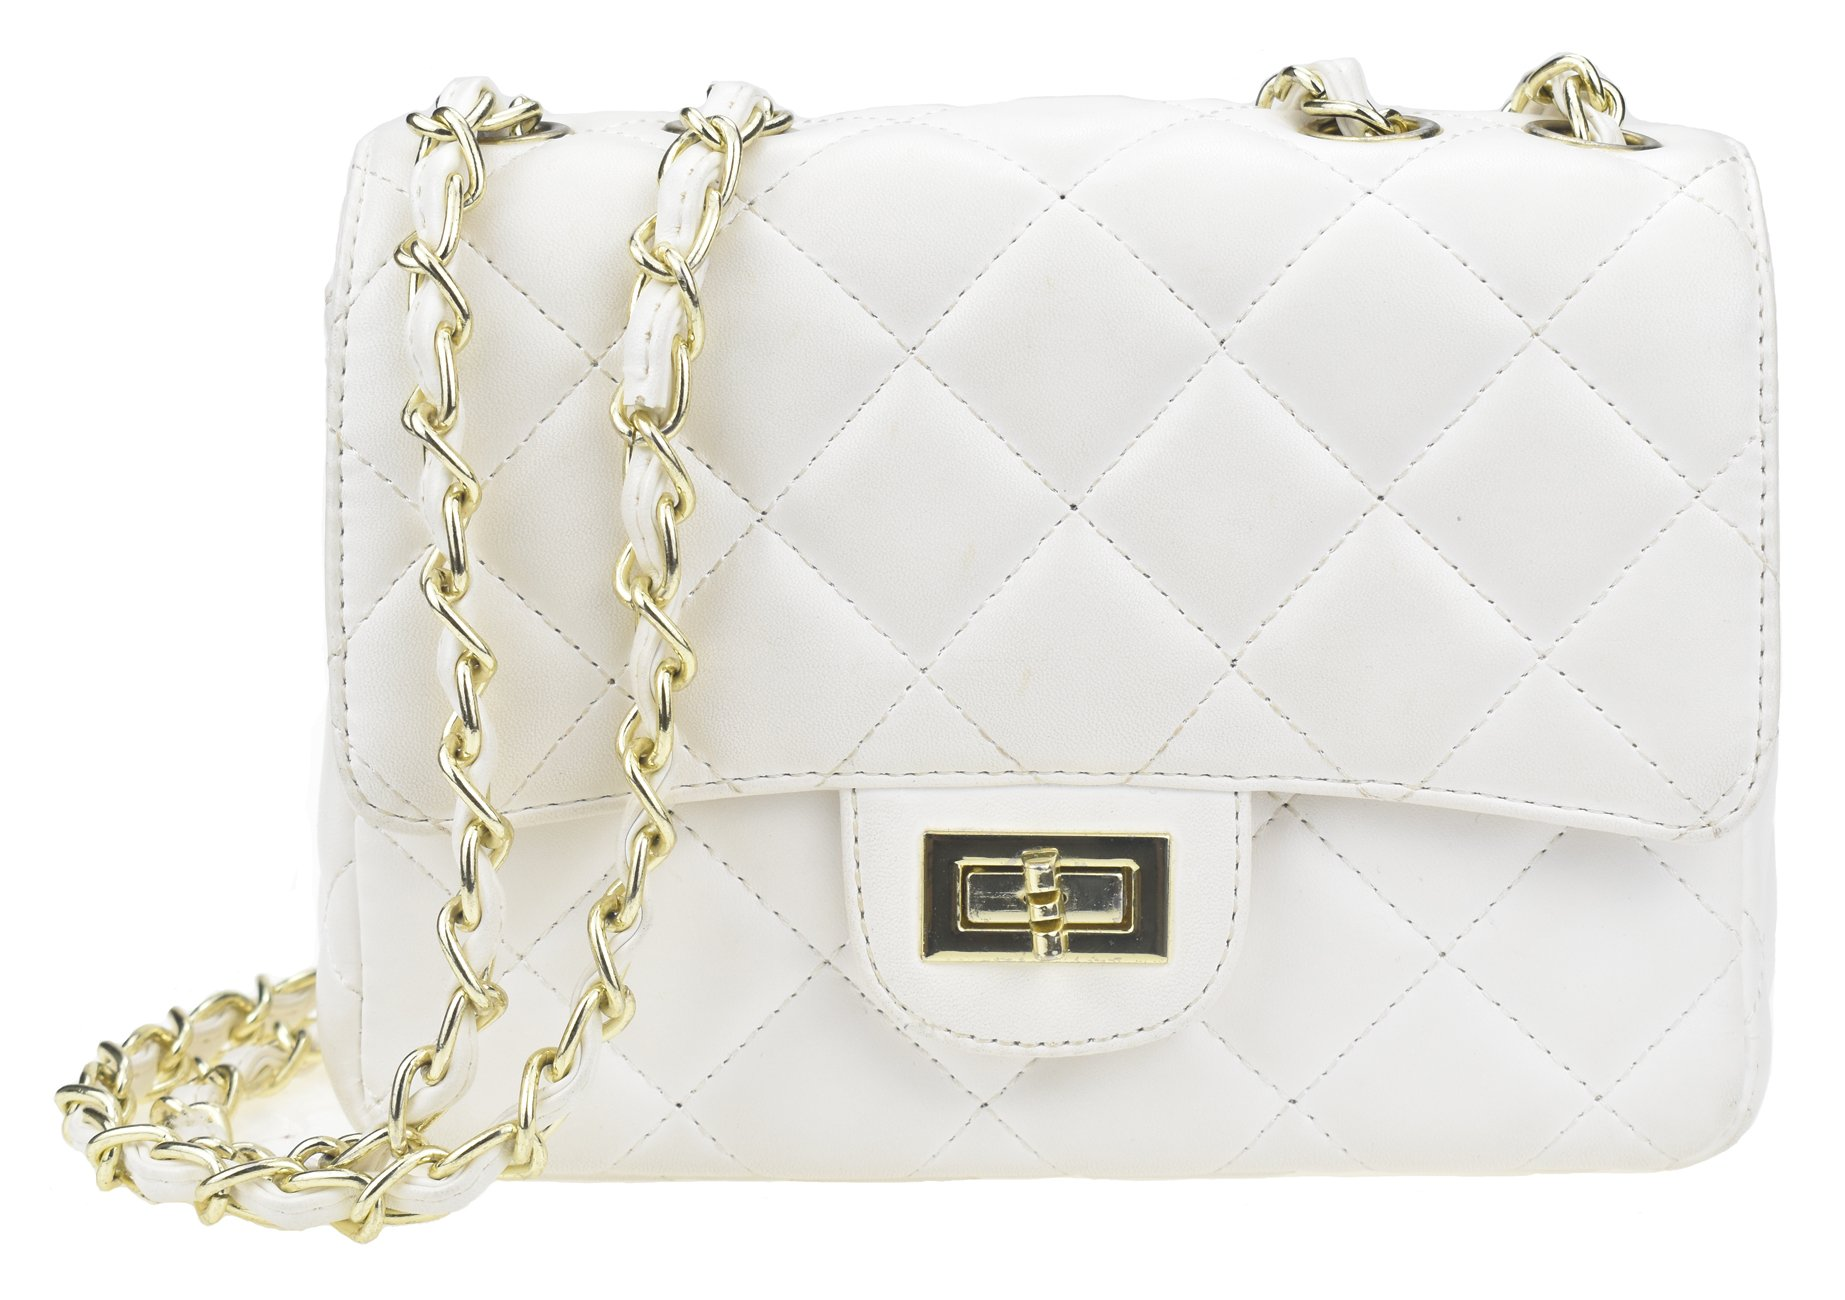 Covelin Women's Leather Fashion Handbag Quilting Envelope Cross Body Shoulder Bag White